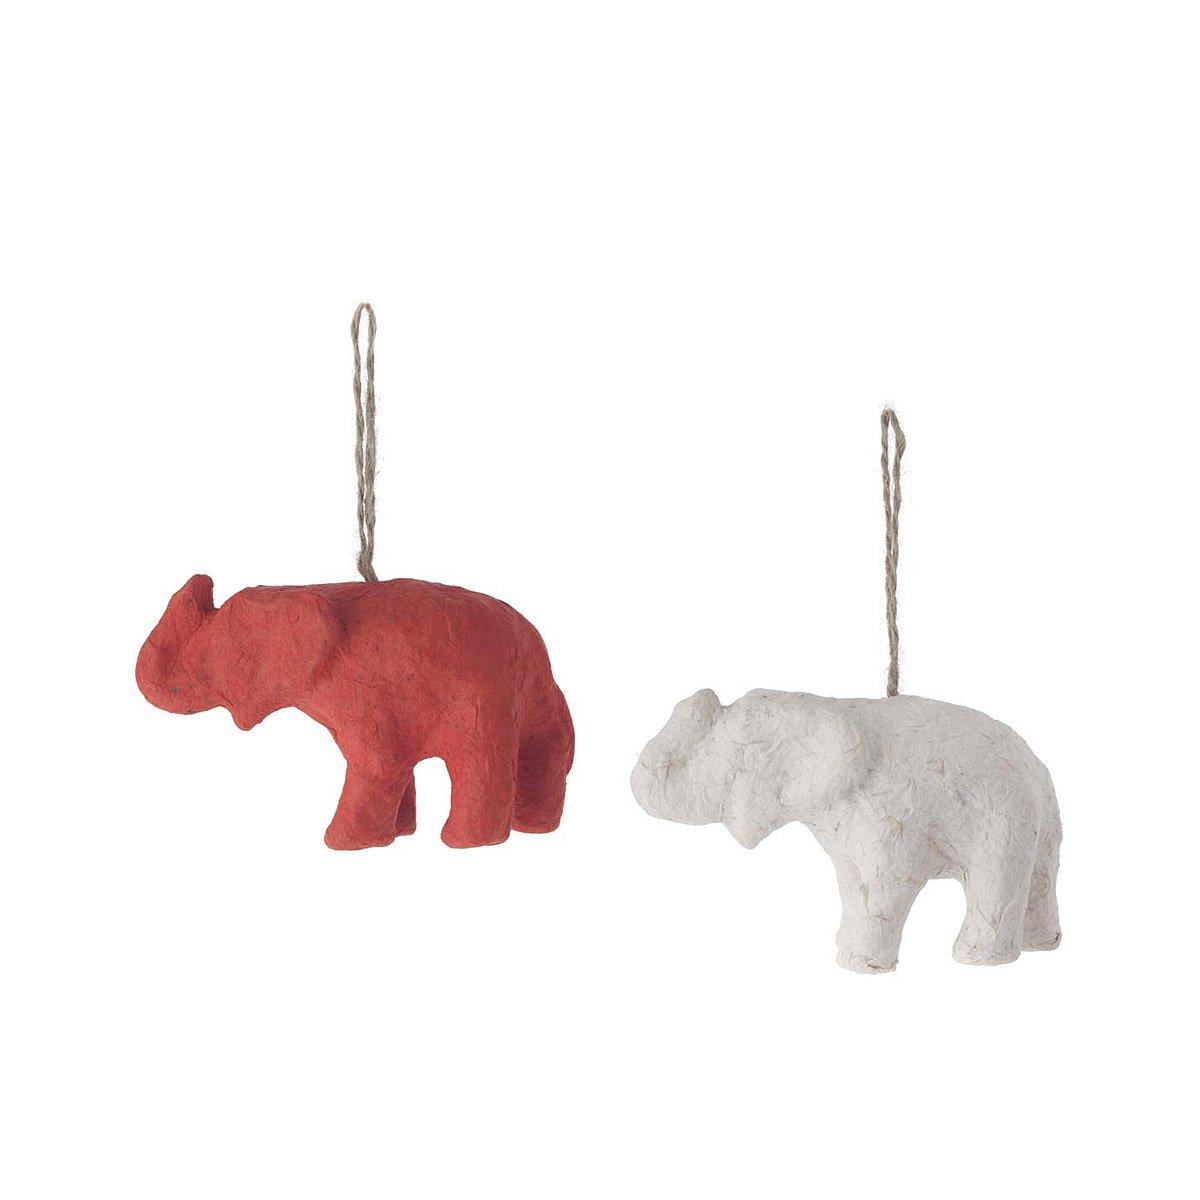 Elephant Poo Paper Elephant Ornaments   Elephant Poop Paper ...